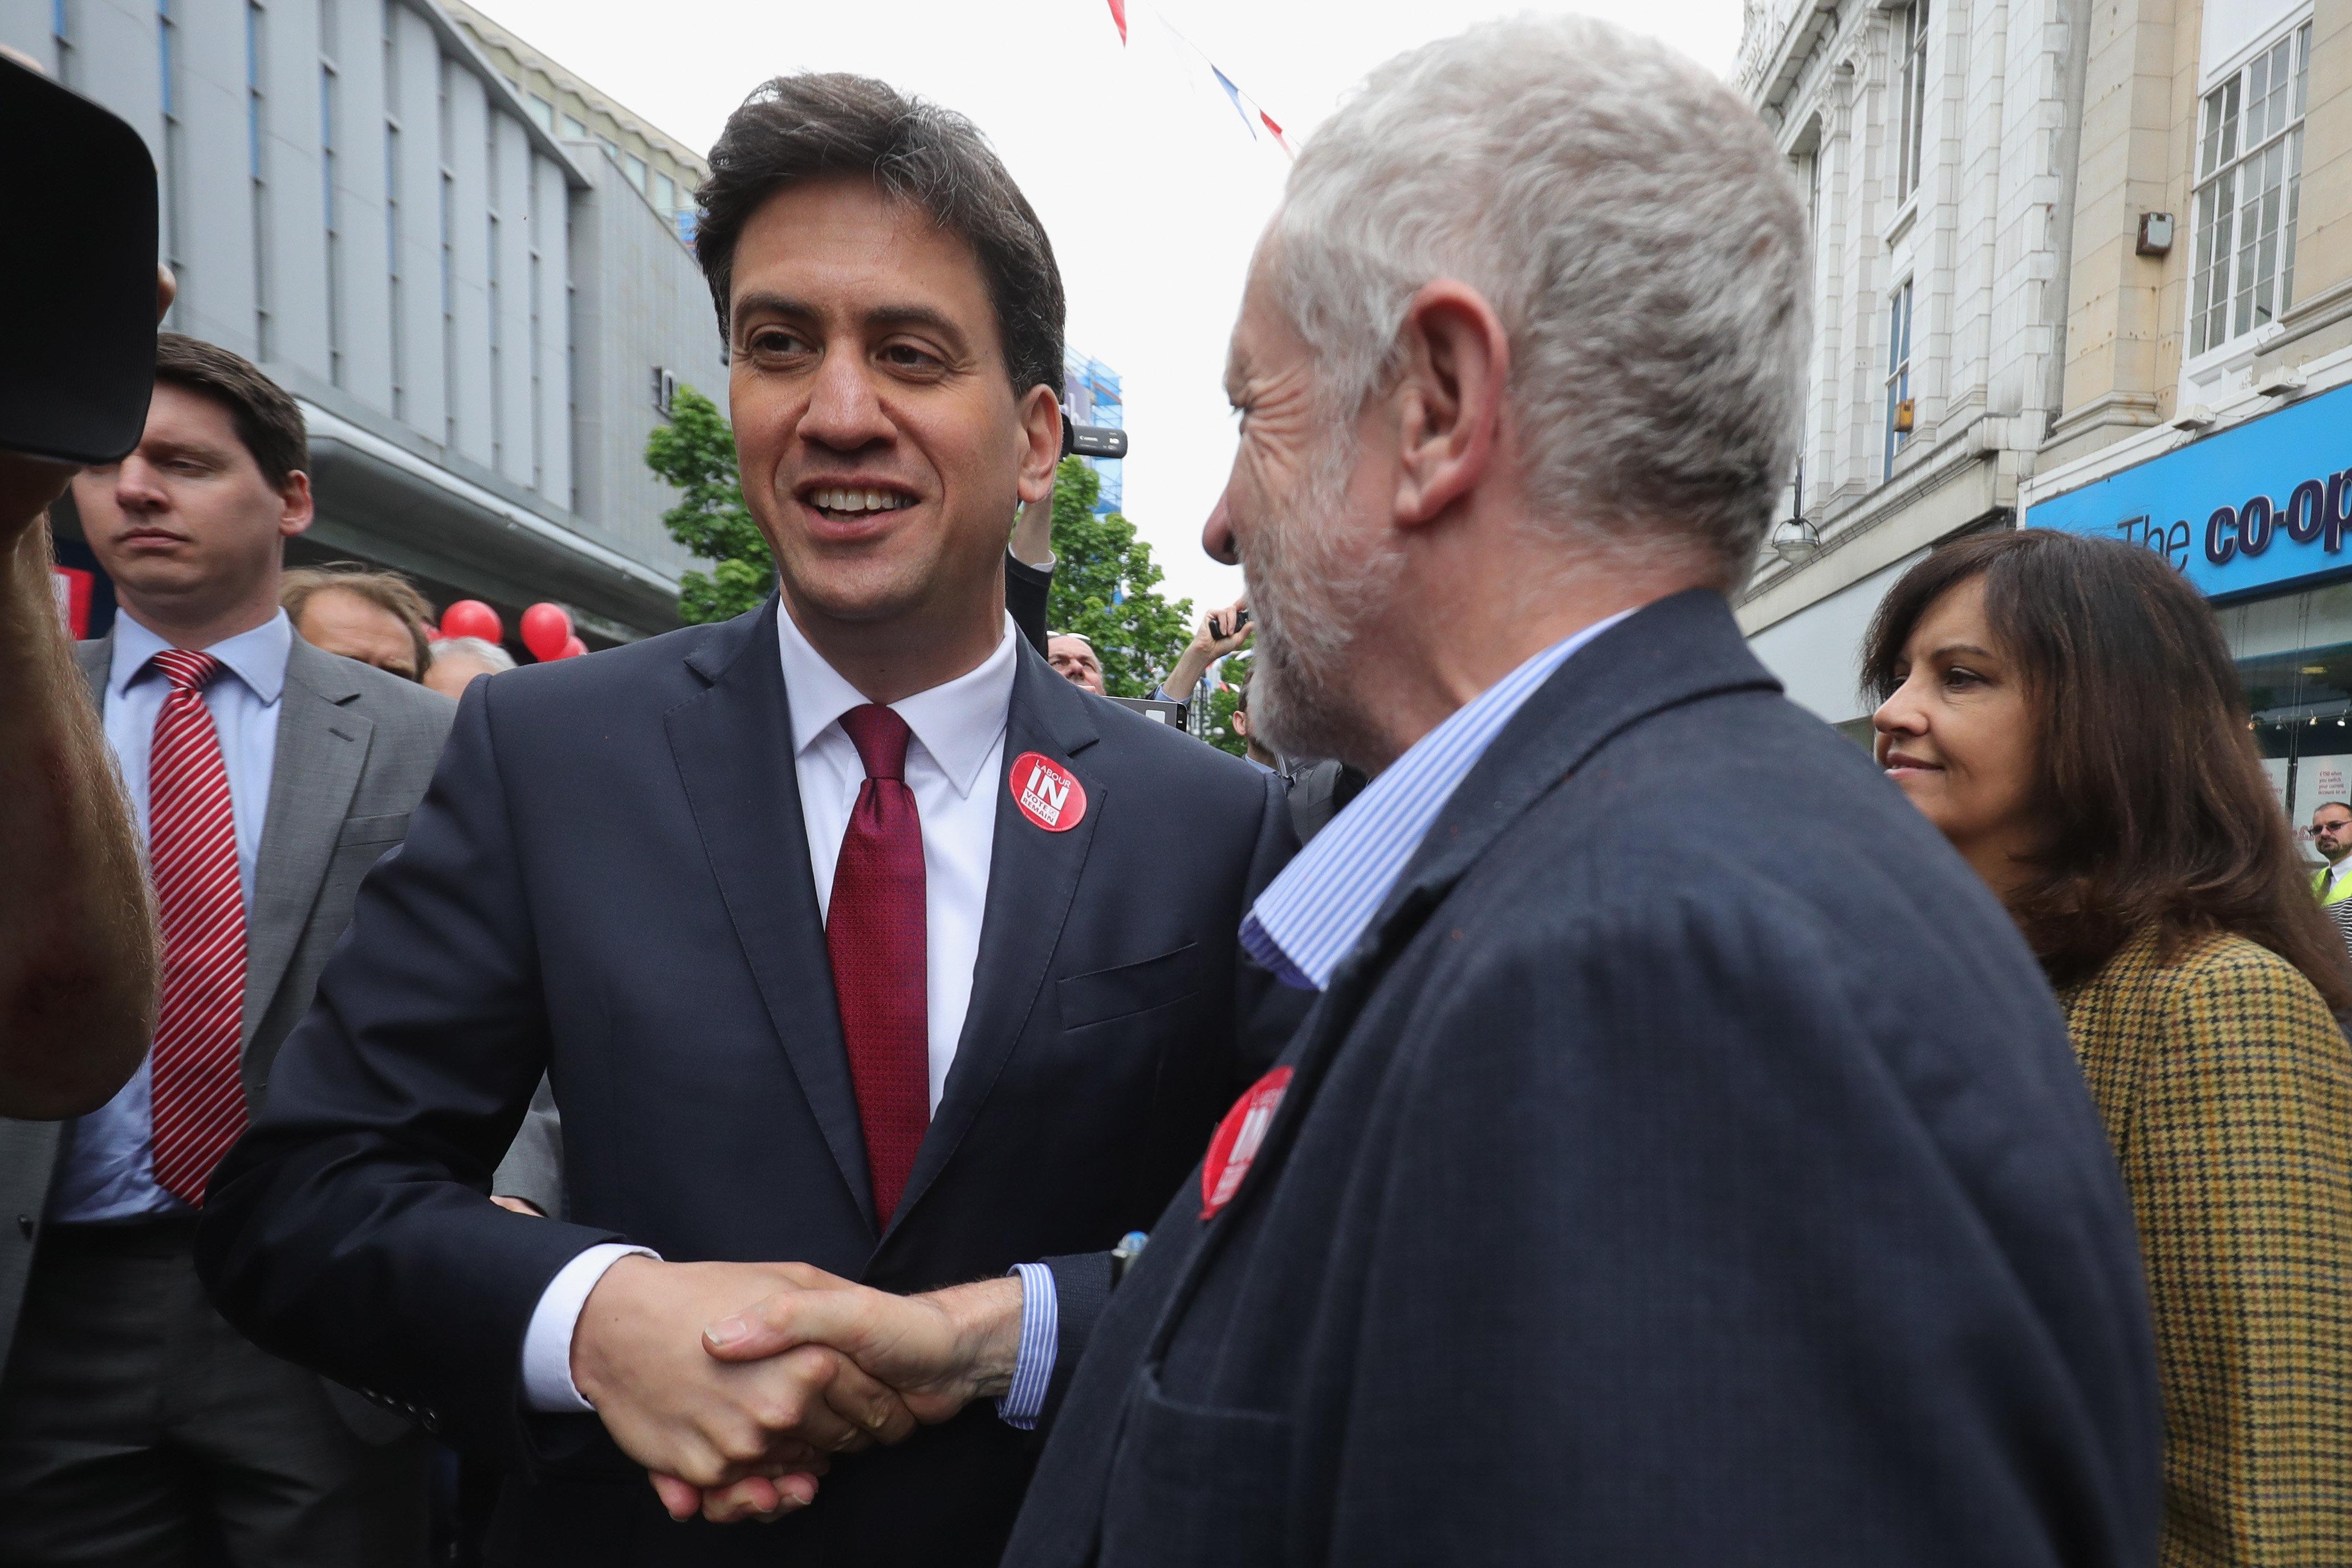 Ed Miliband and Jeremy Corbyn.